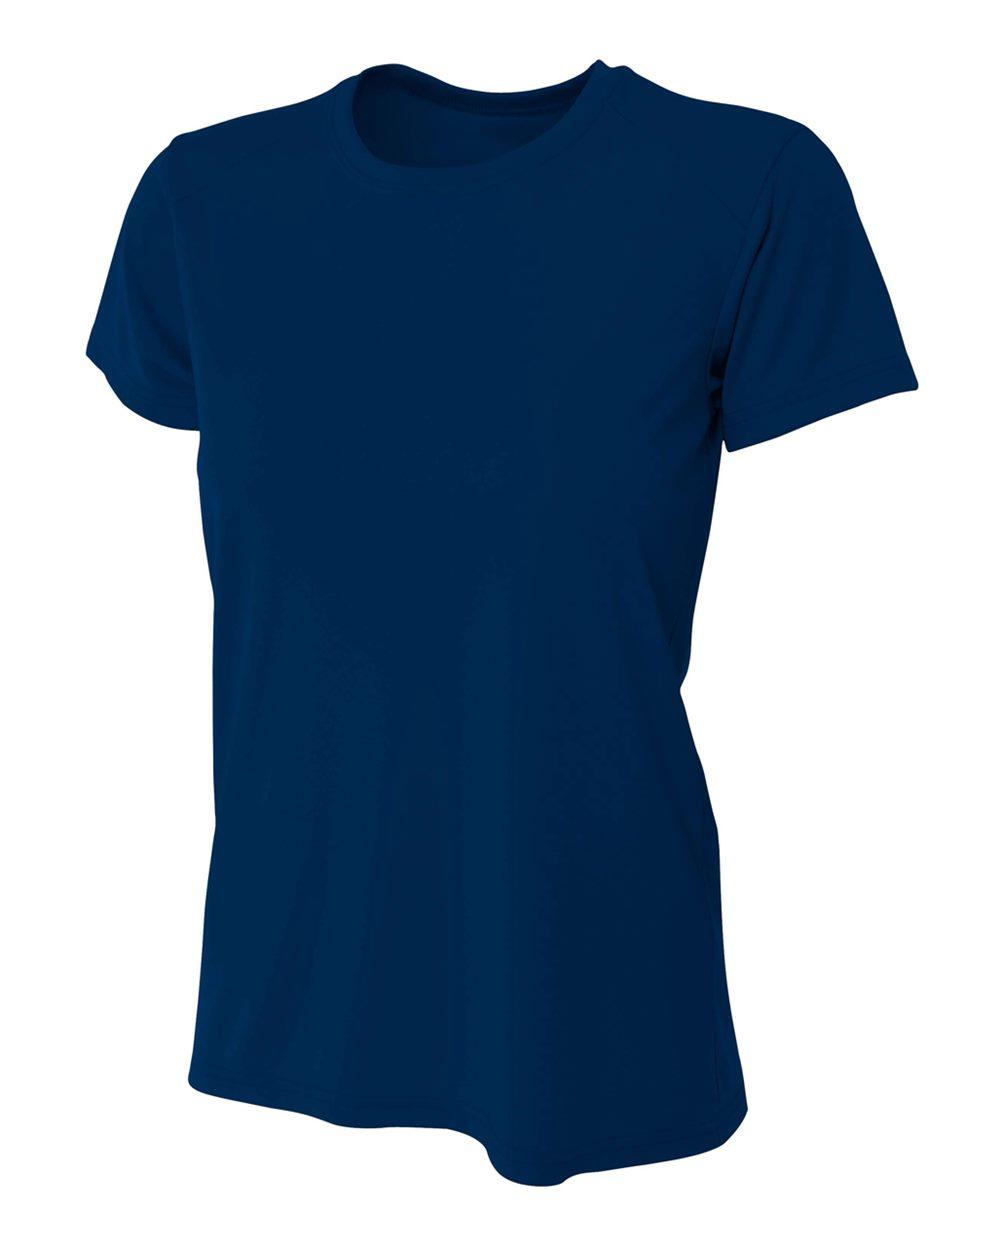 womens-polo-mwicking-navy-blue.jpg